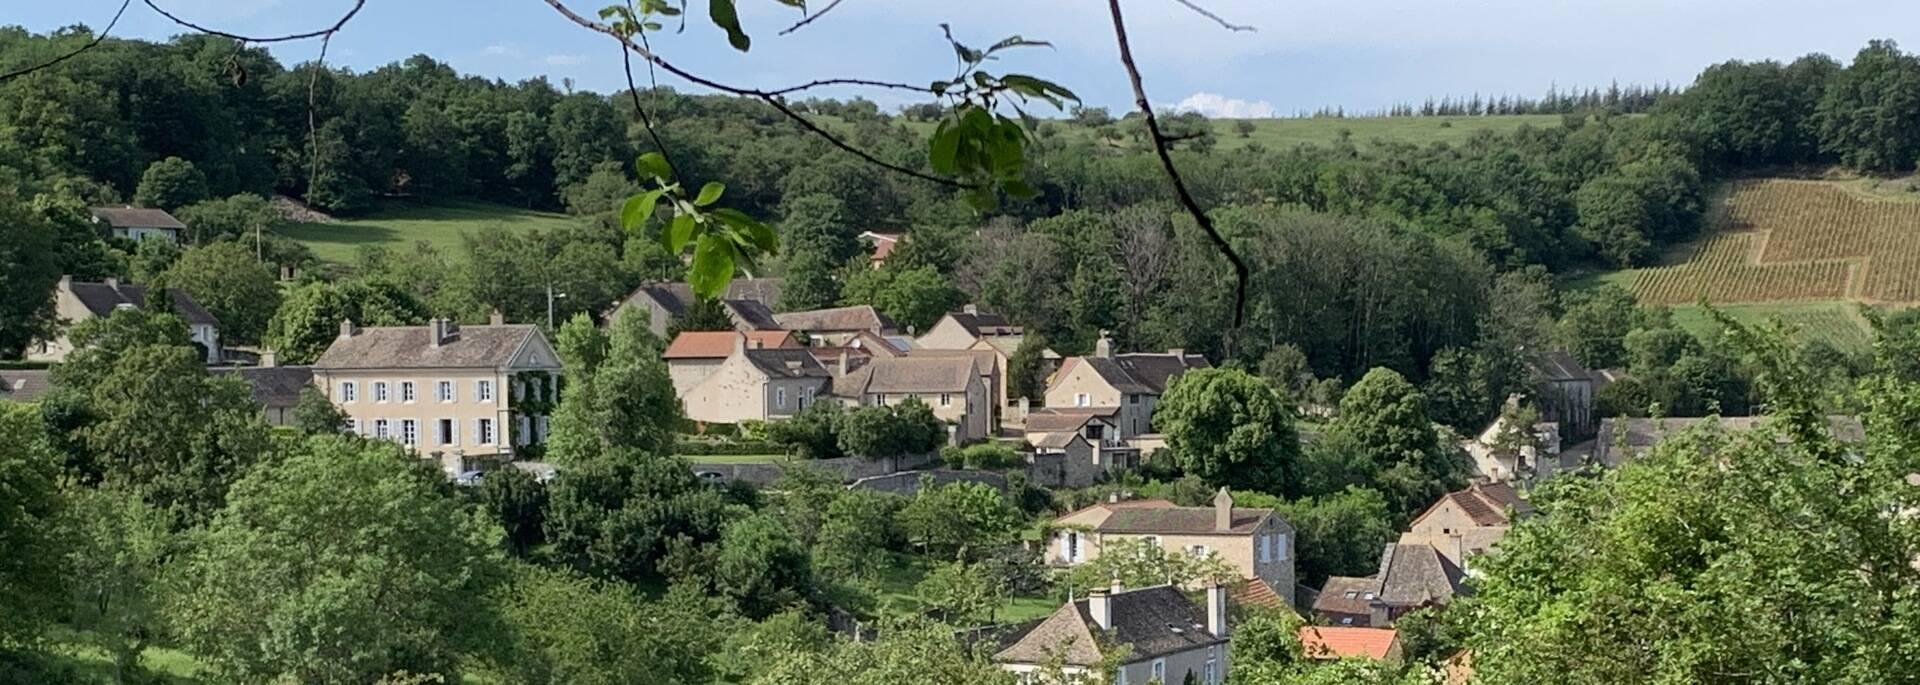 Randonnée Givry Russilly Côte Chalonnaise